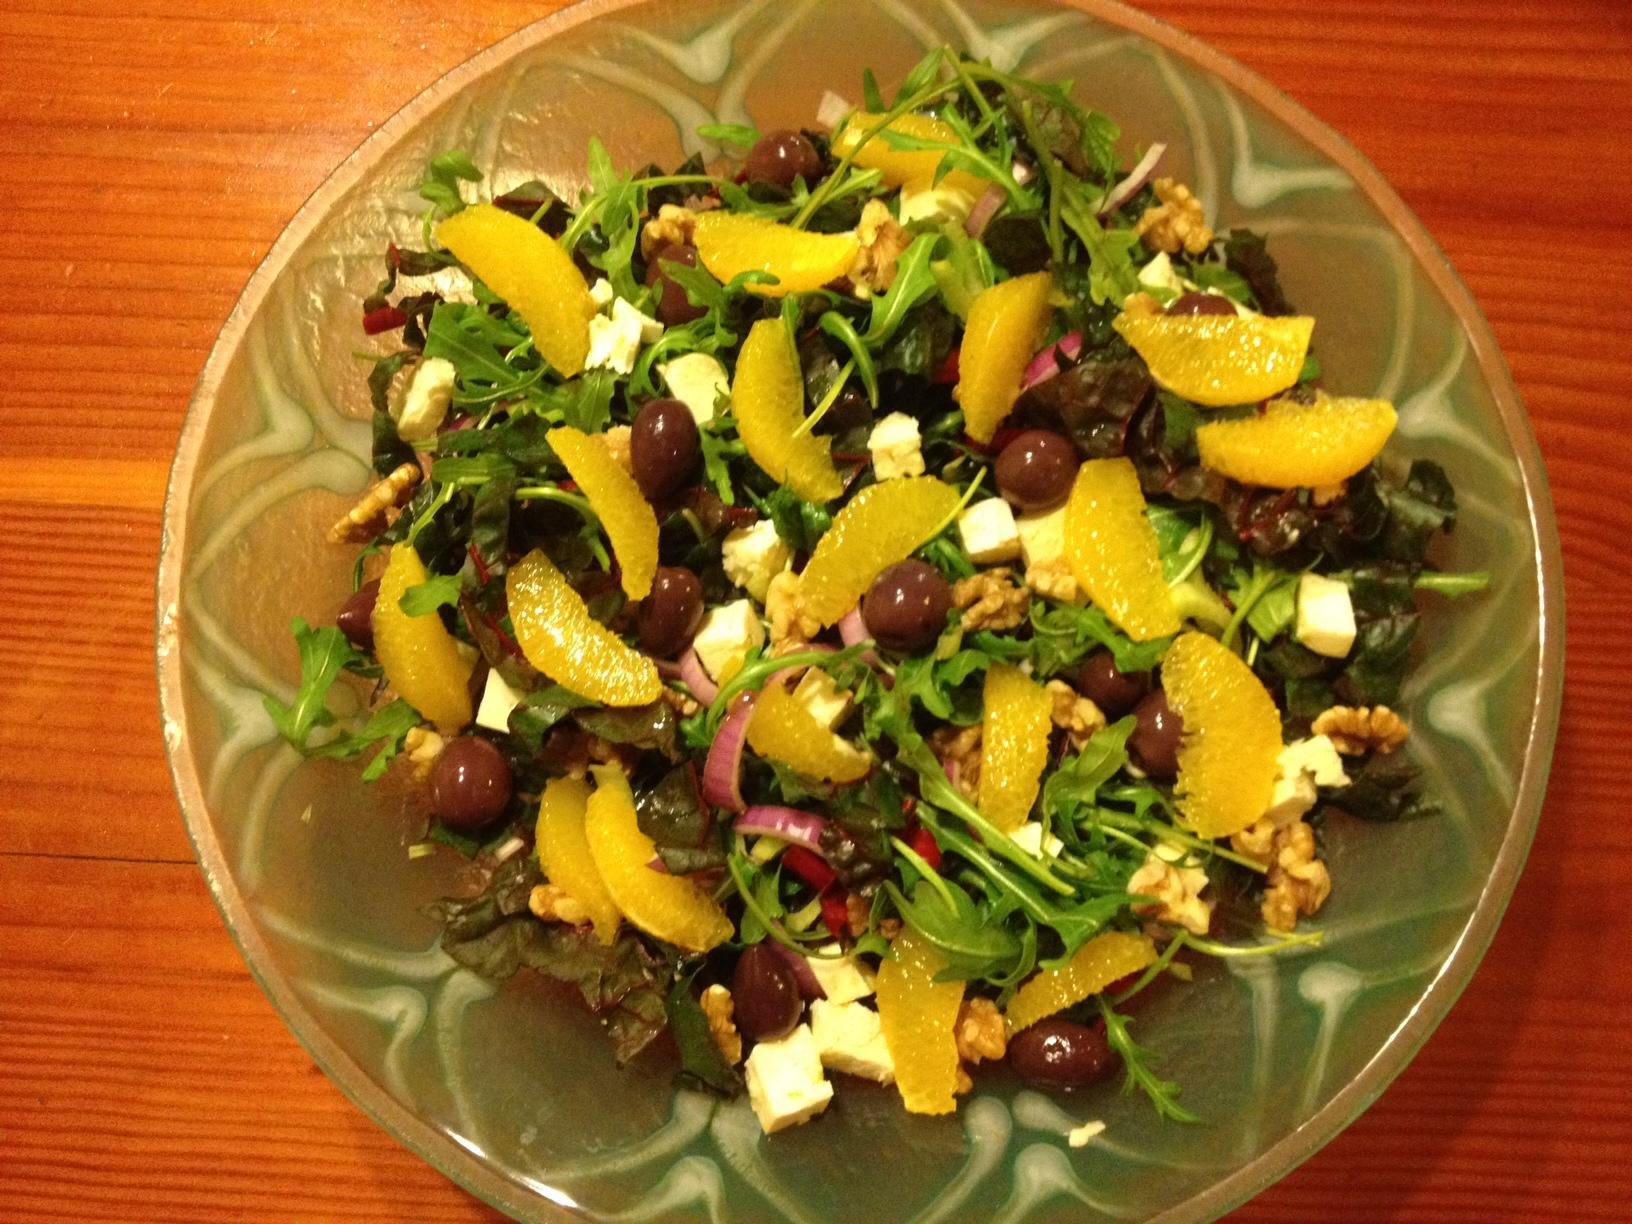 fennel and orange salad salad with orange fennel fennel and orange ...